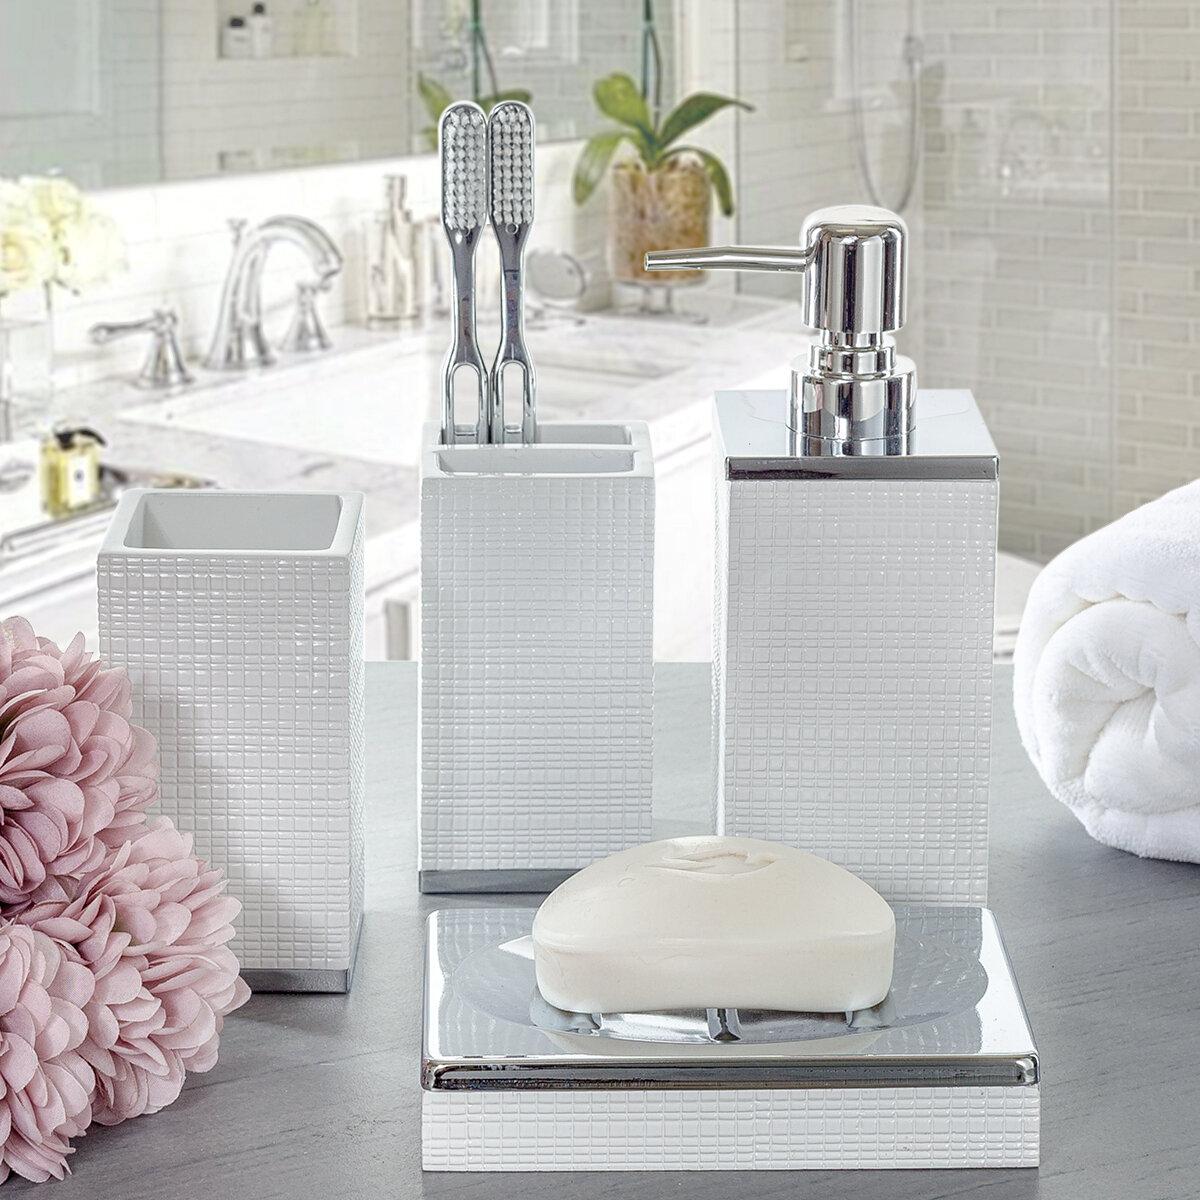 Despain 4 Piece Bathroom Accessory Set